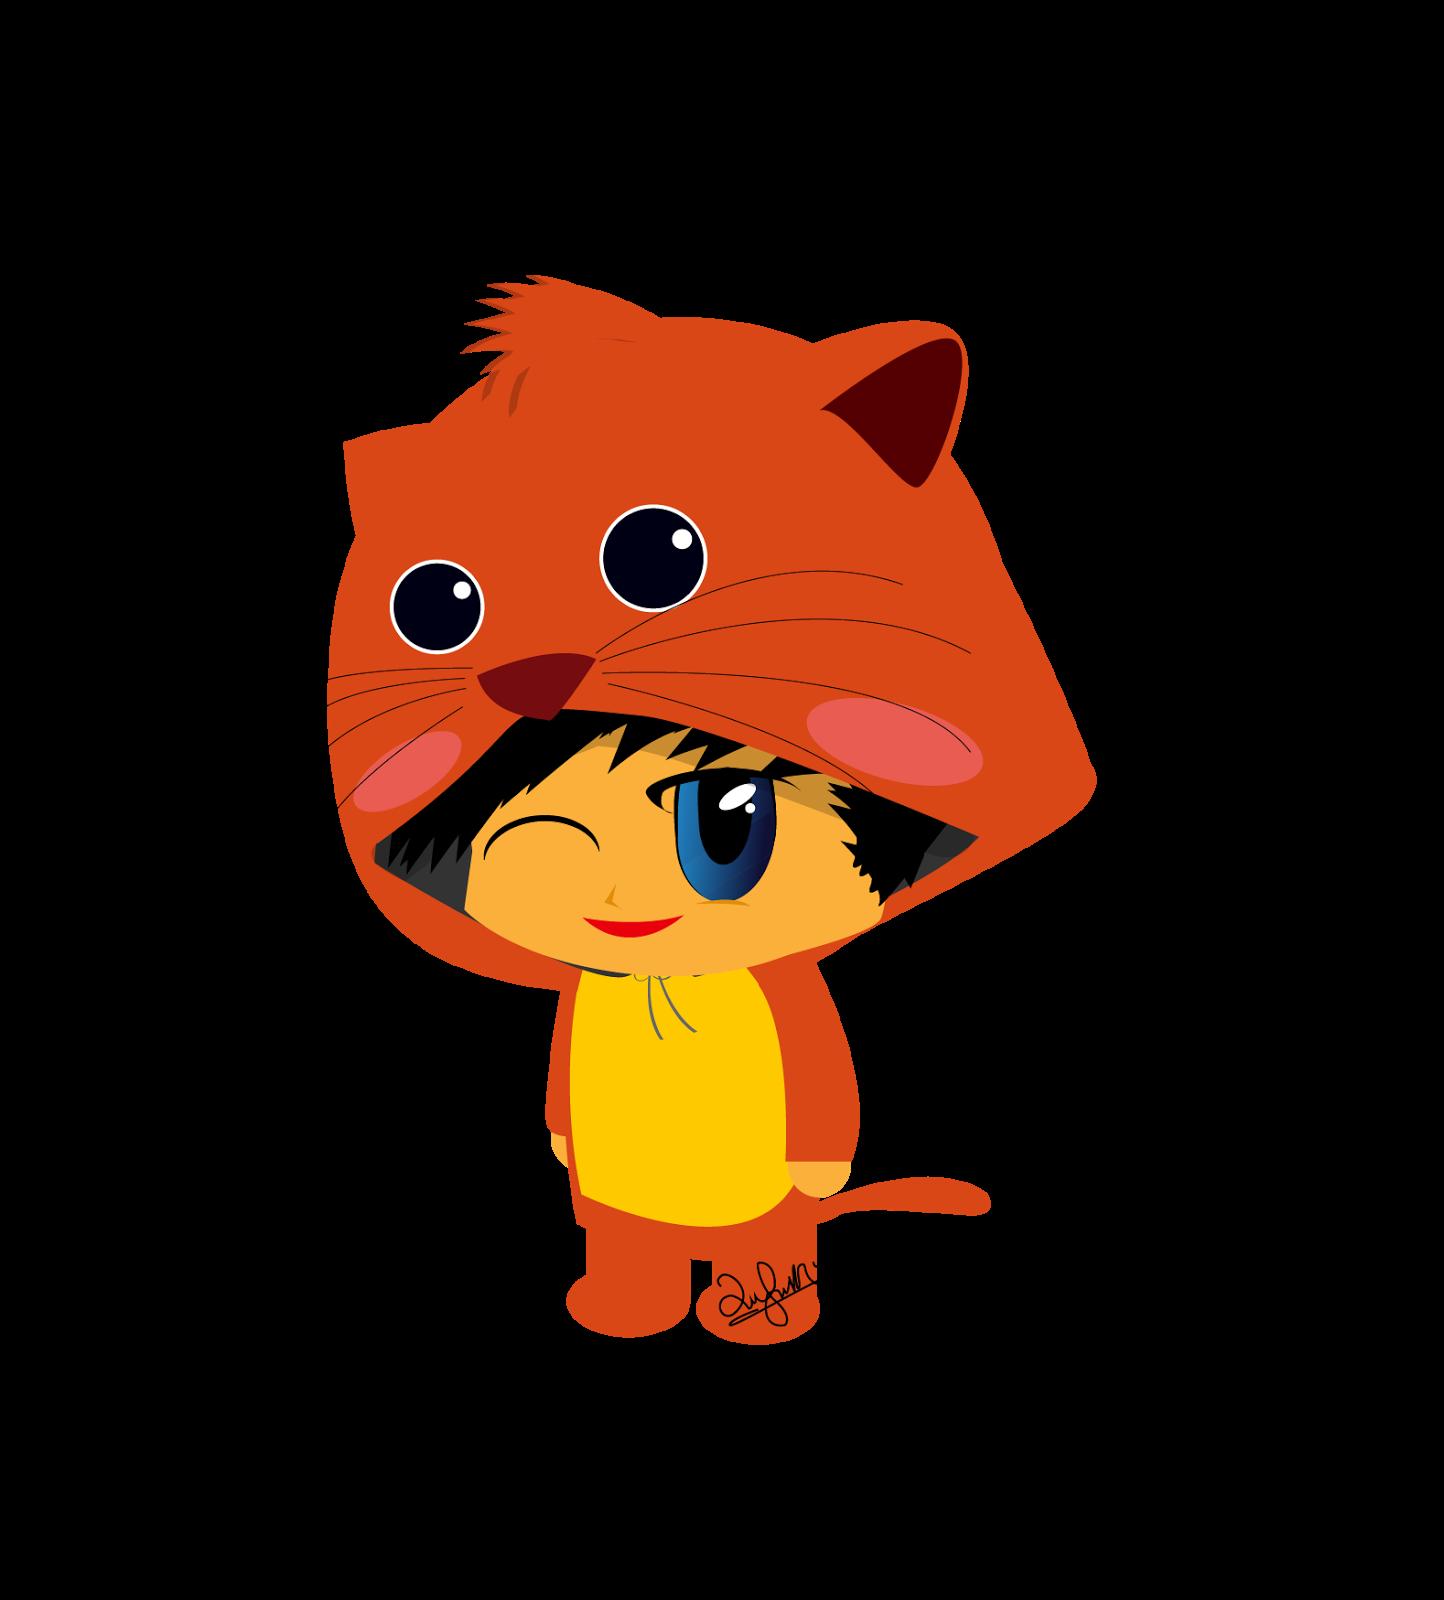 January clipart animated. Freebies doodle wearing animal